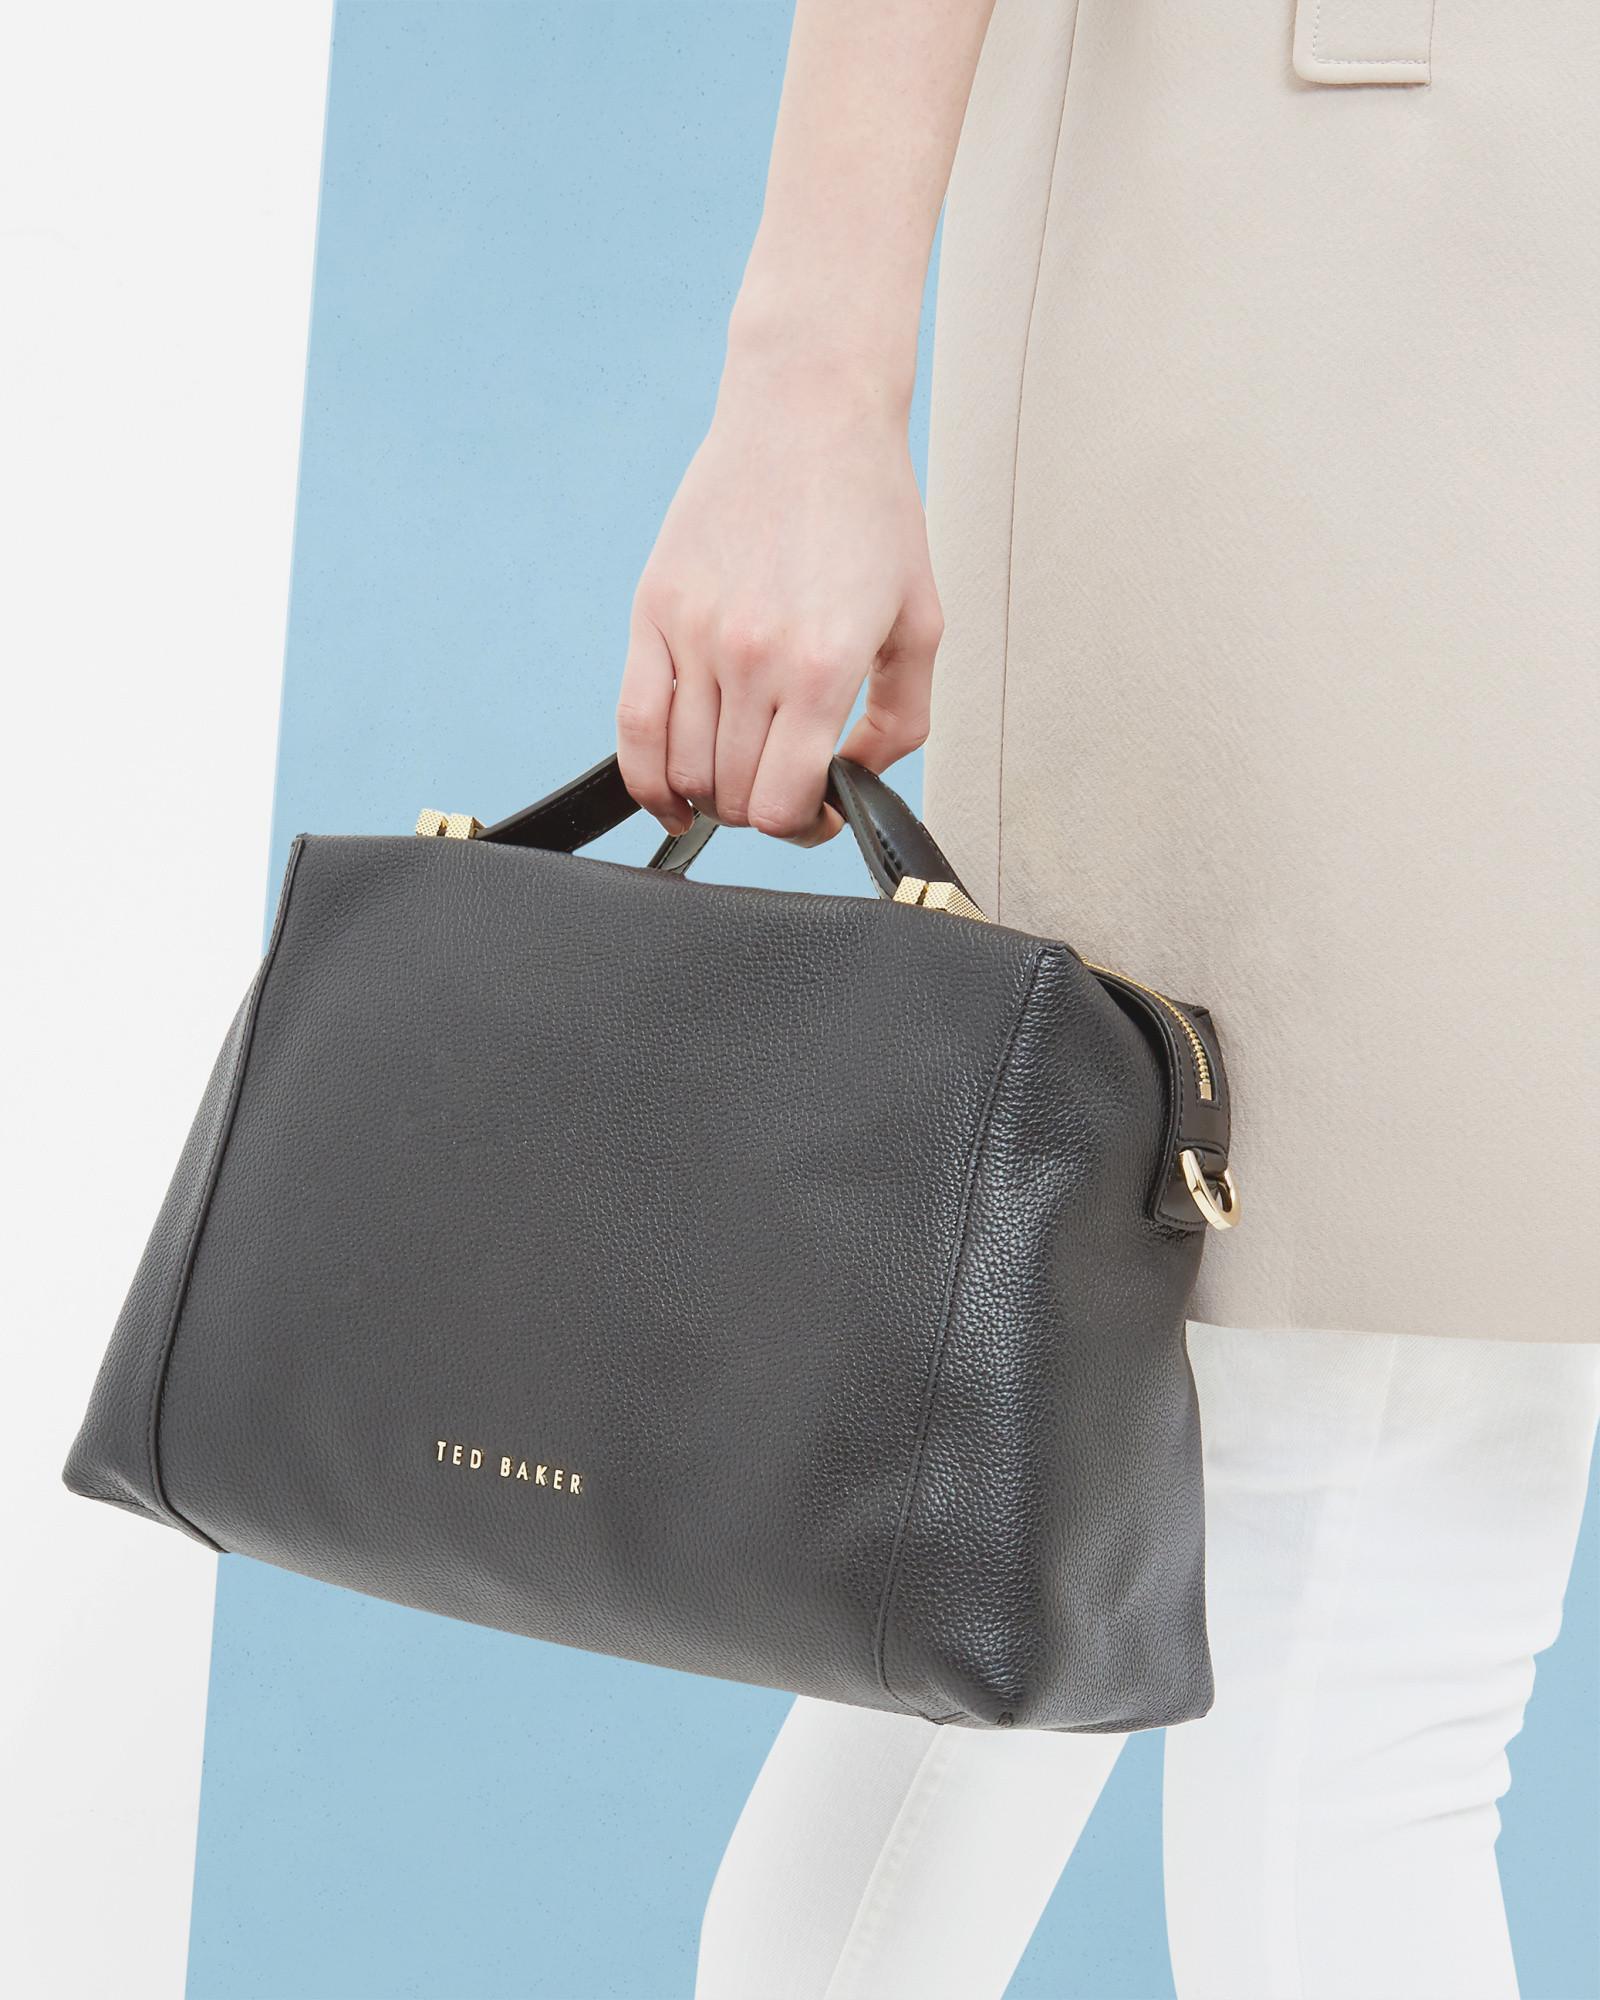 7dd022d06 Lyst - Ted Baker Pop Handle Large Tote Bag in Black